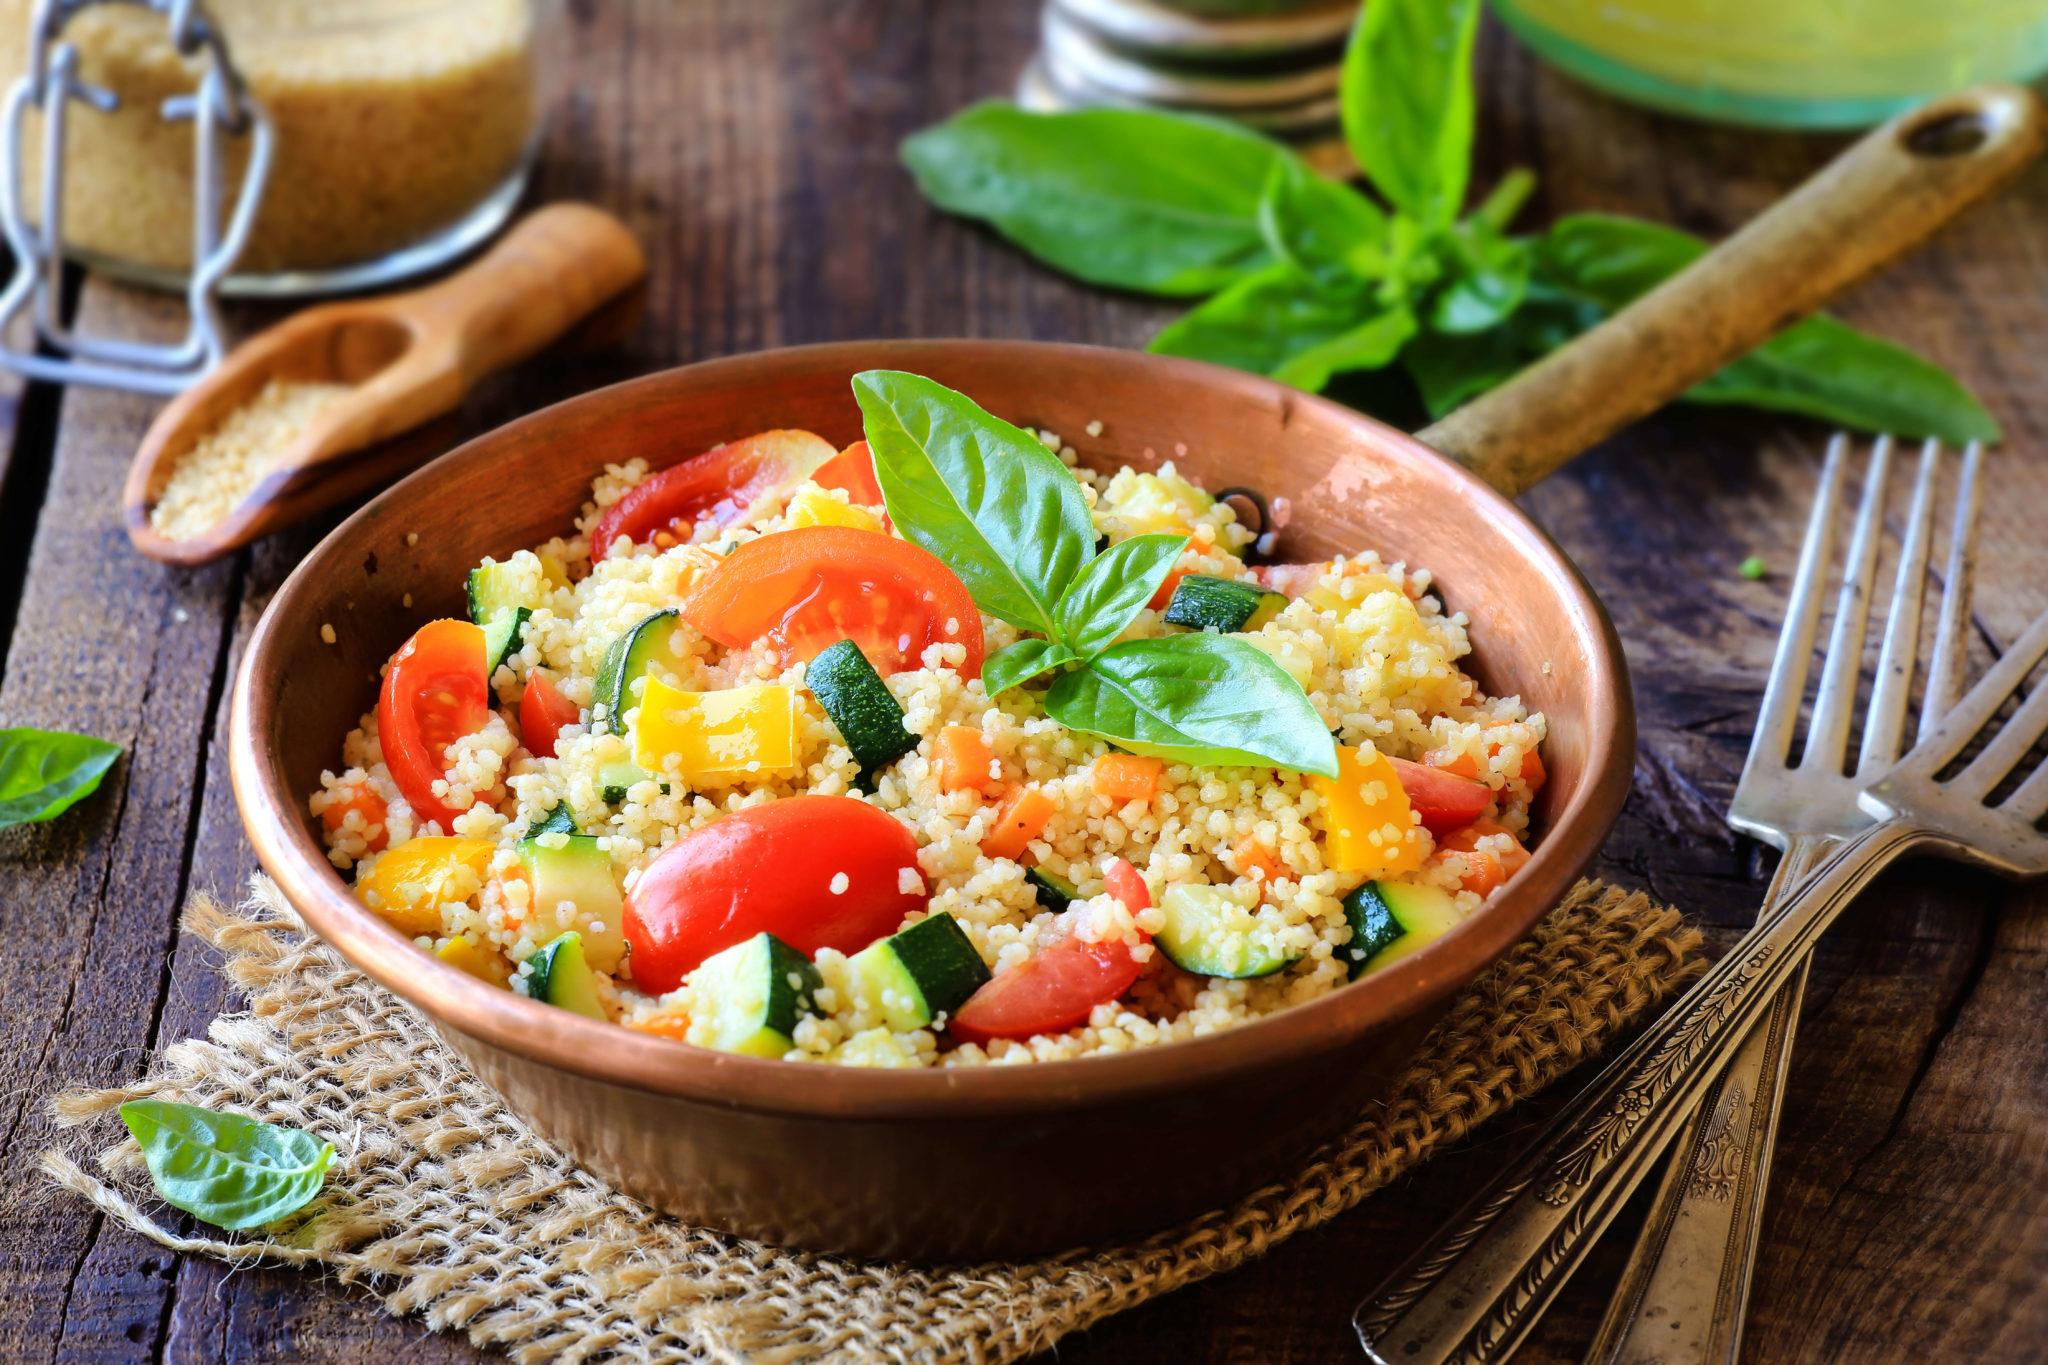 upfit-bunter-couscous-salat